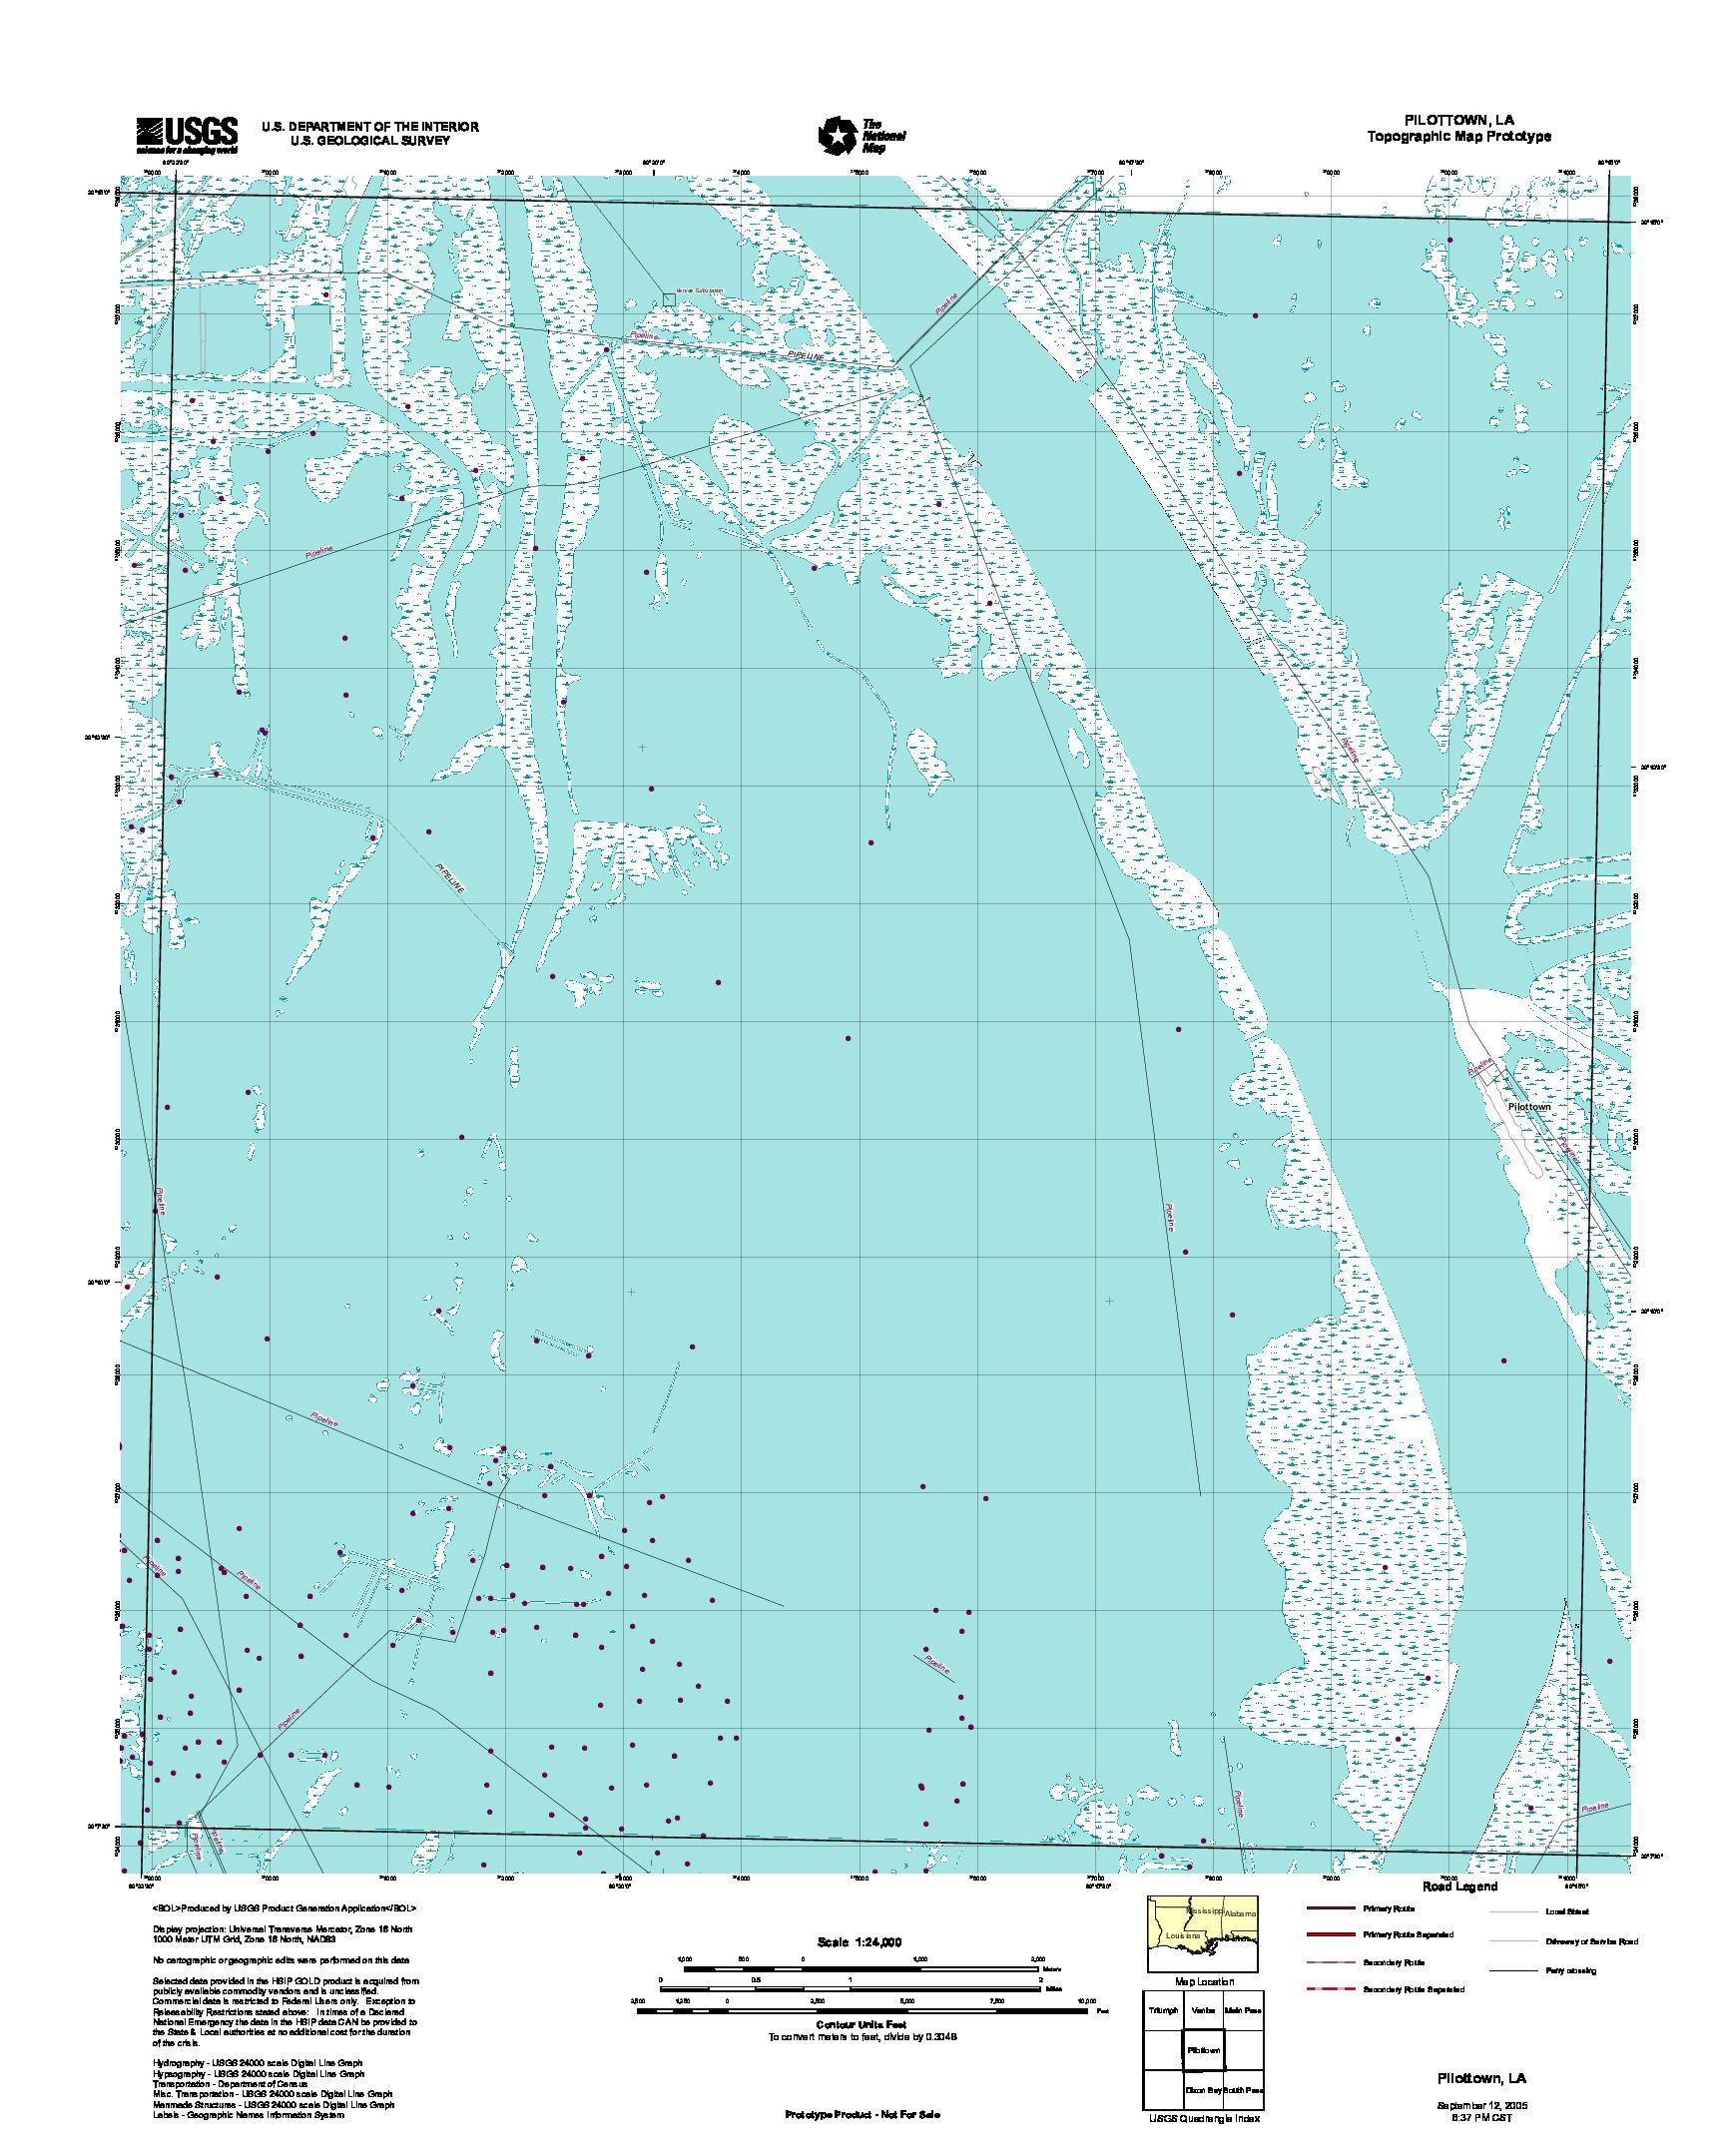 Prototipo de Mapa Topográfico de Pilottown, Luisiana, Estados Unidos, Septiembre 12, 2005